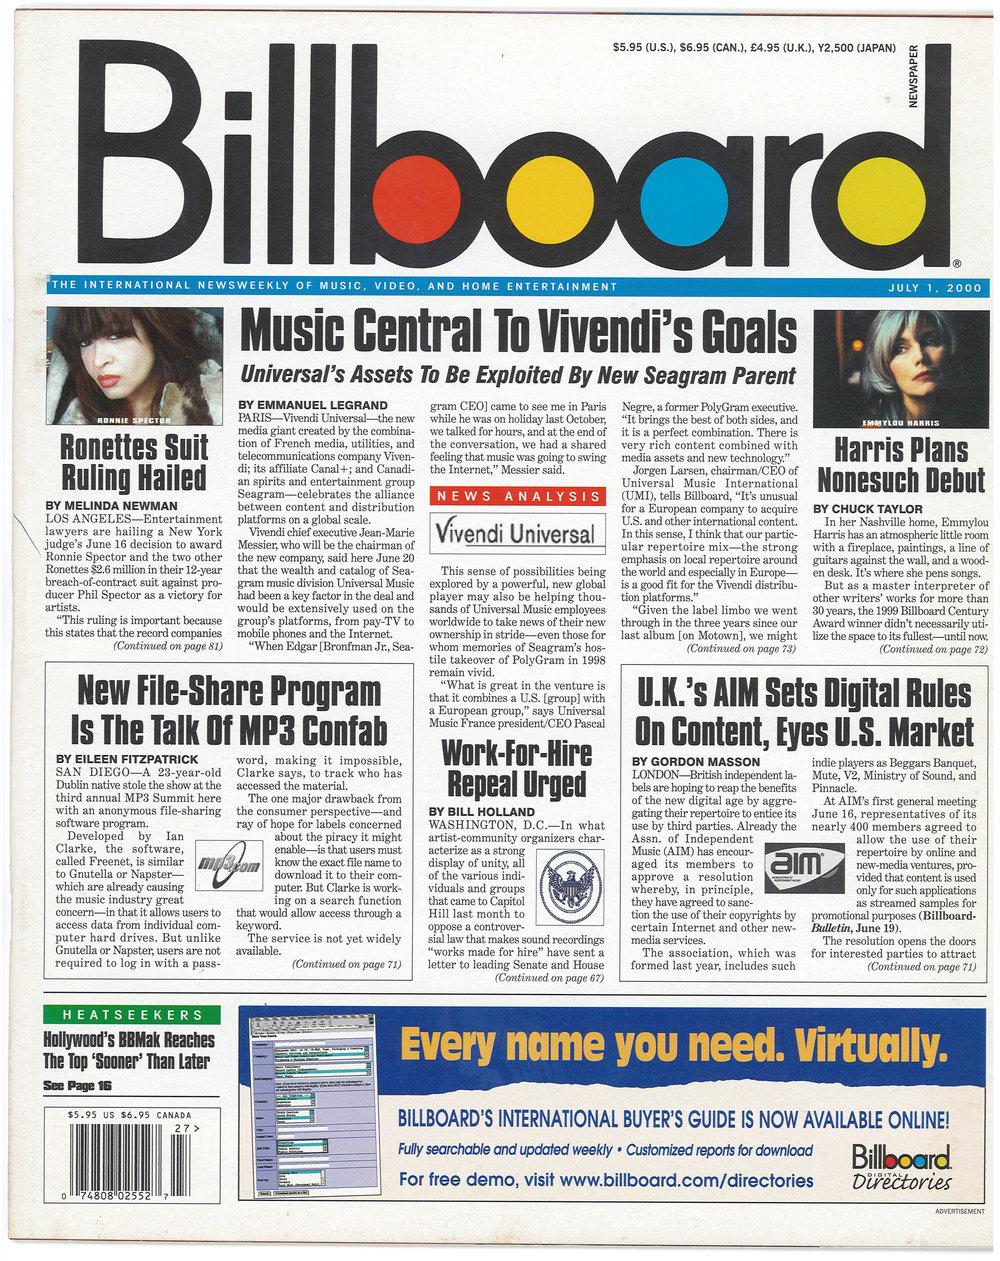 WLWLTDOO-2000-EPHEMERA-BILLBOARD_MAGAZINE-07012000.jpg